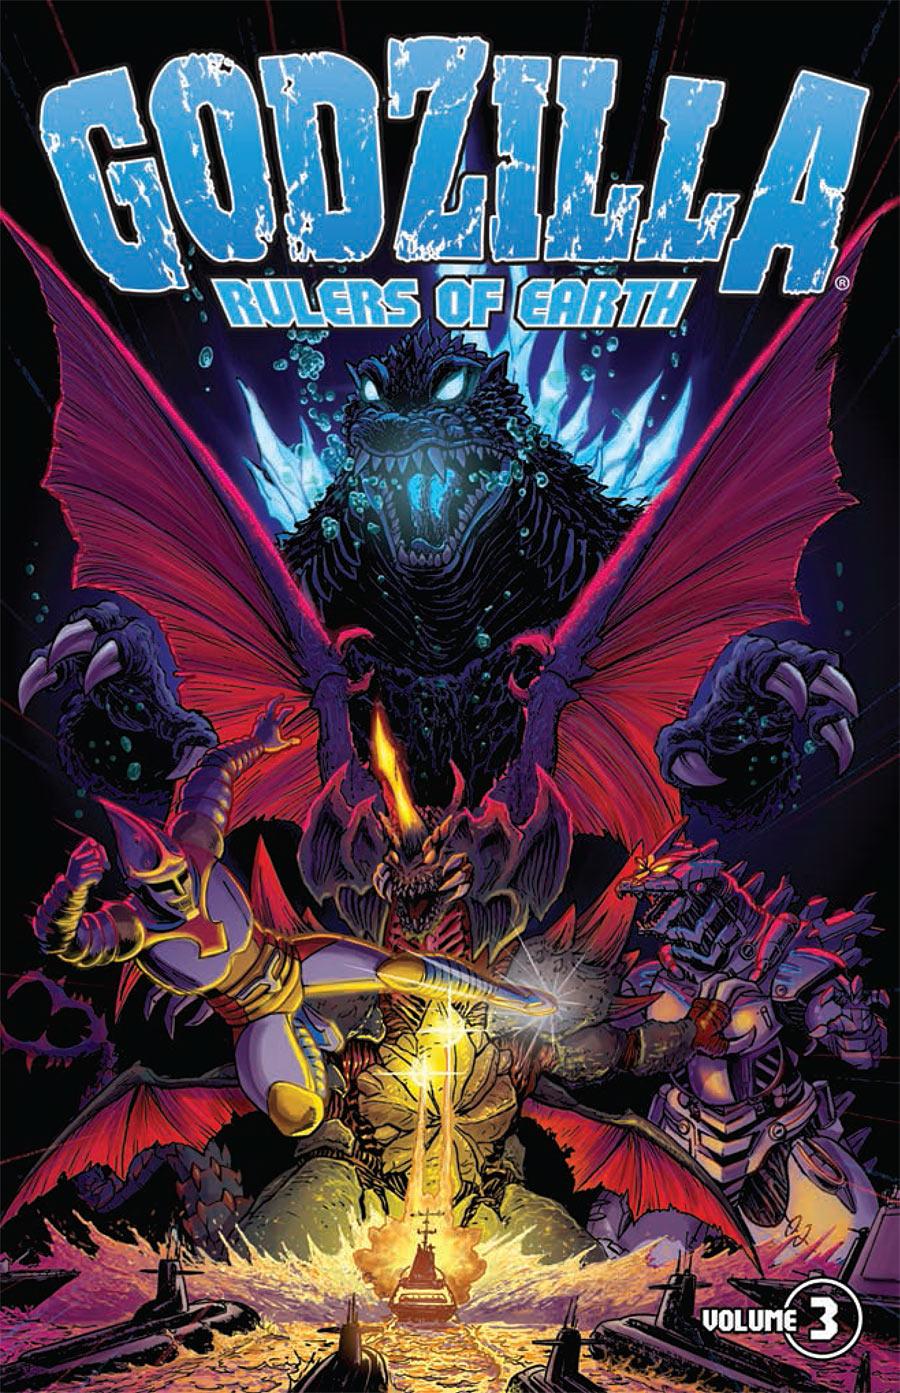 Godzilla: Rulers of Earth Vol. 3 TP